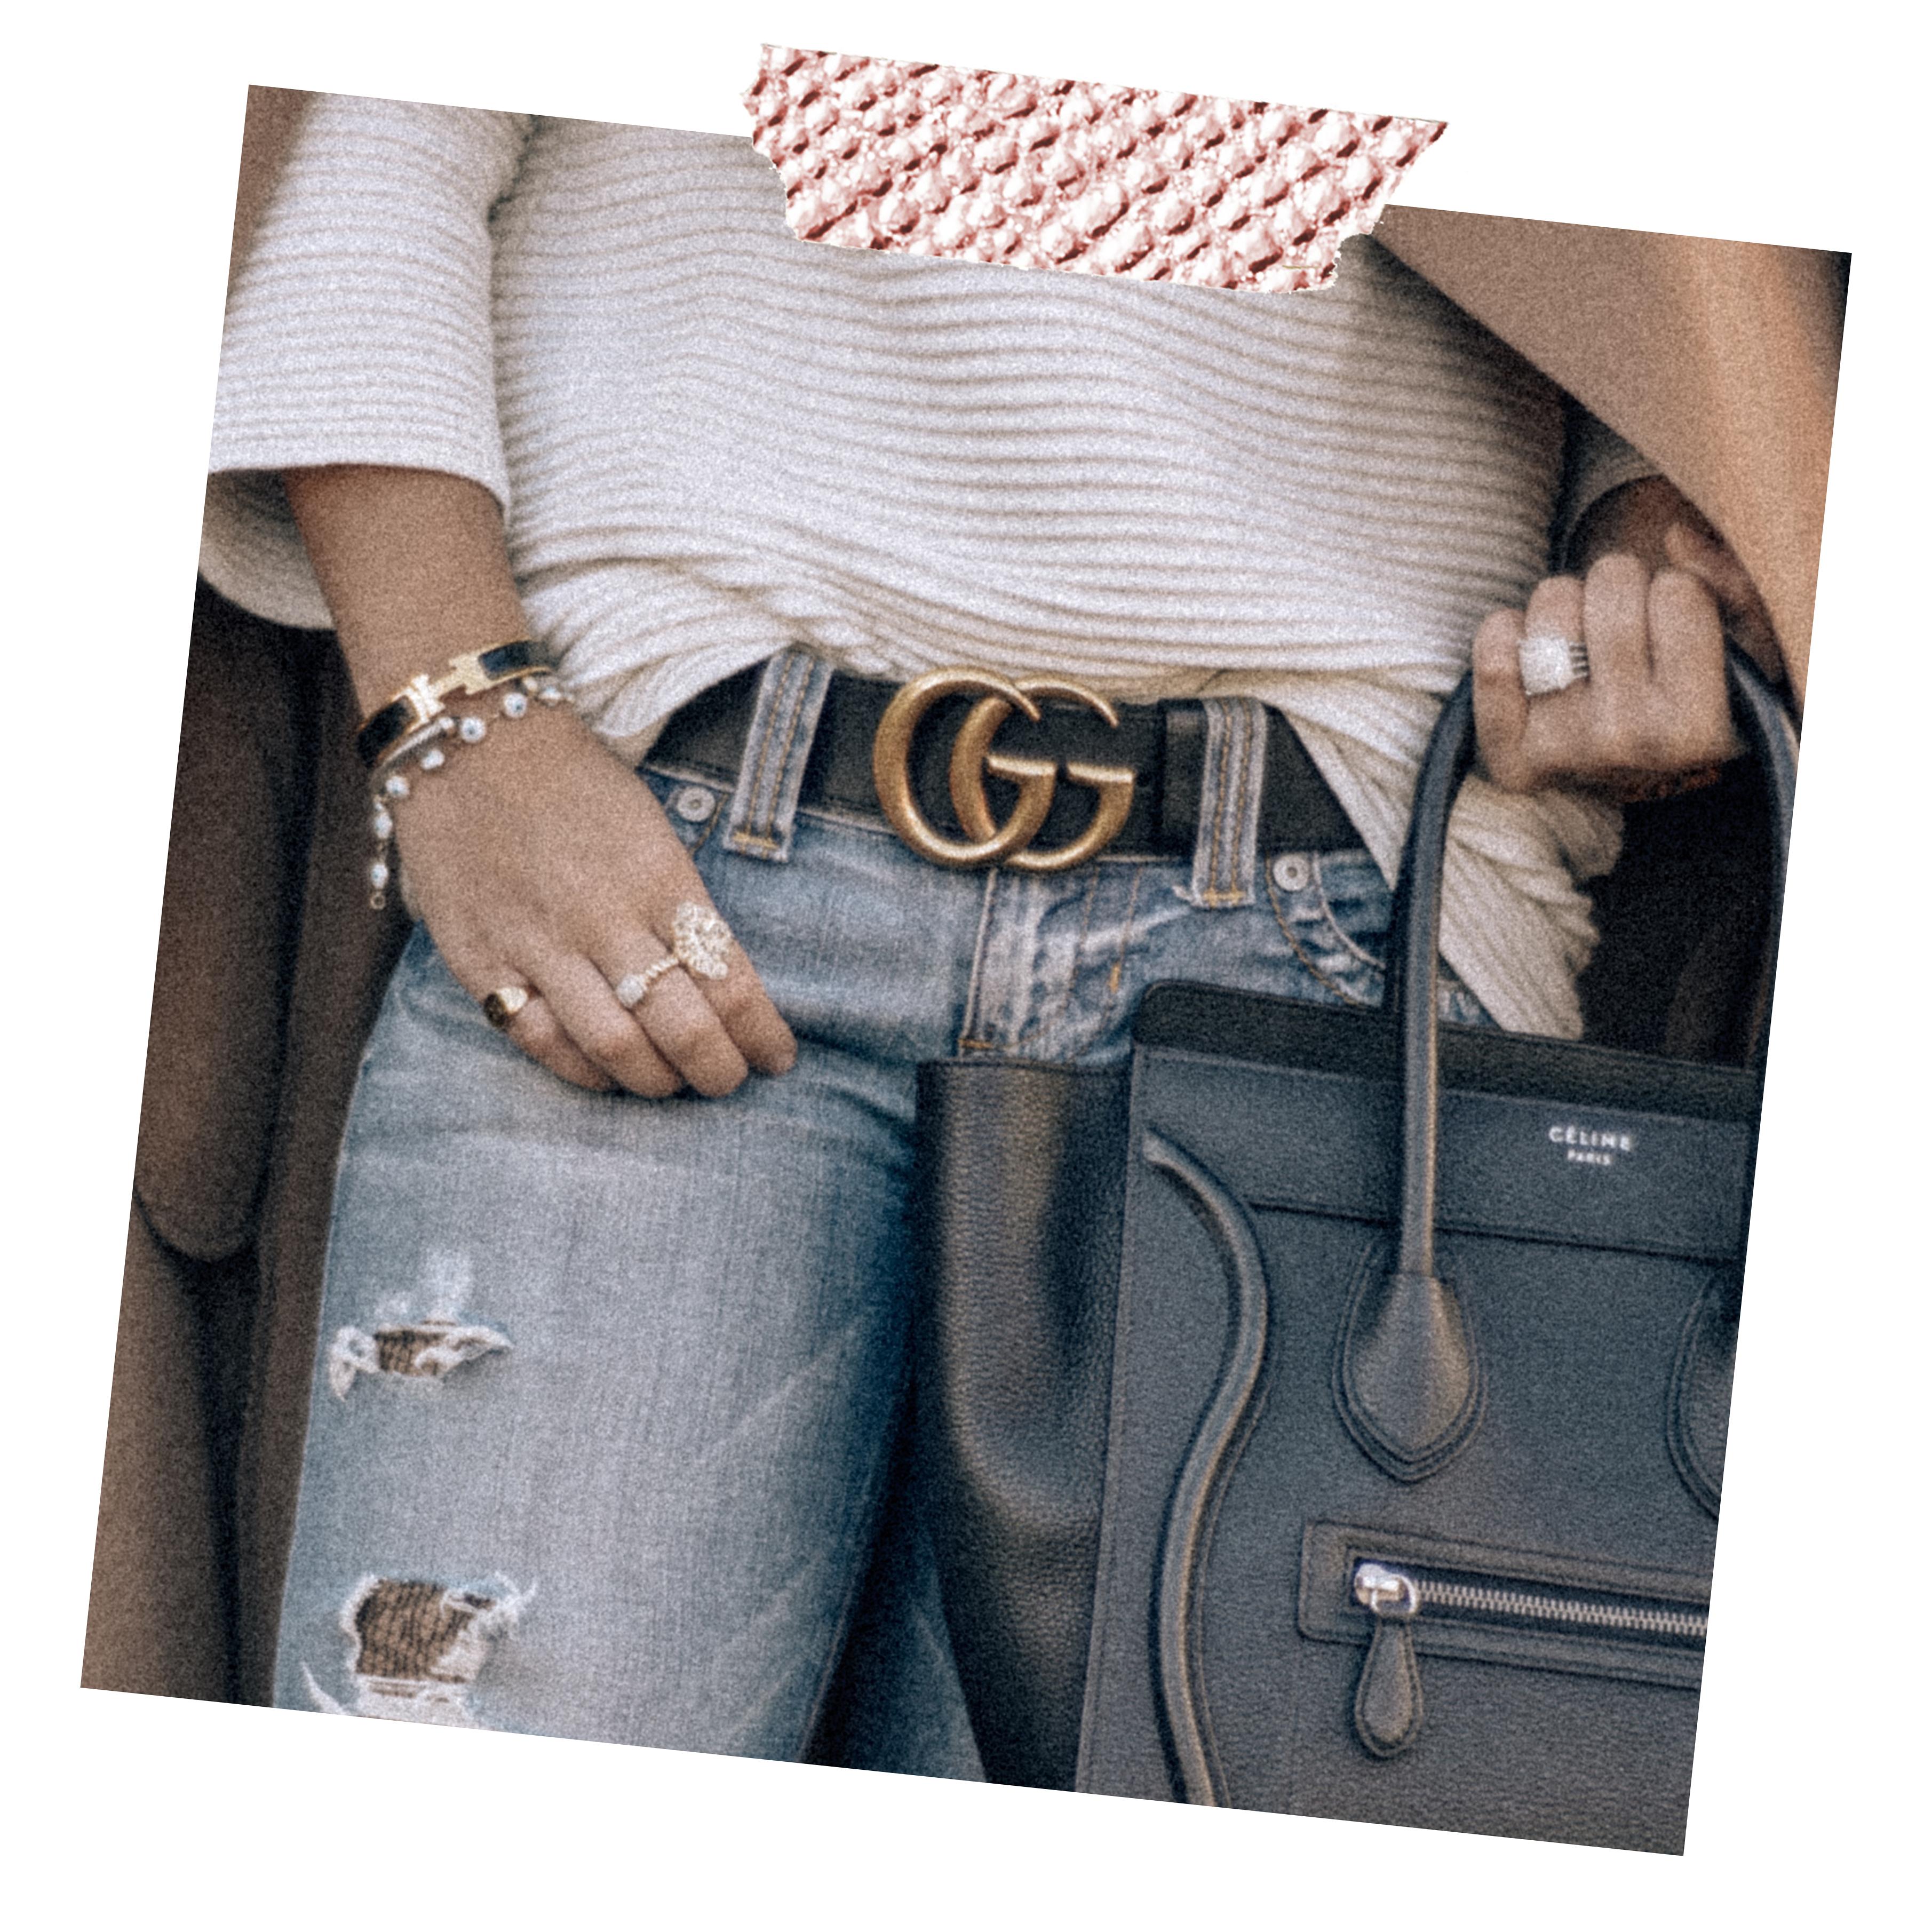 Designer Items Reviewed (Chanel dd5cf4c278068